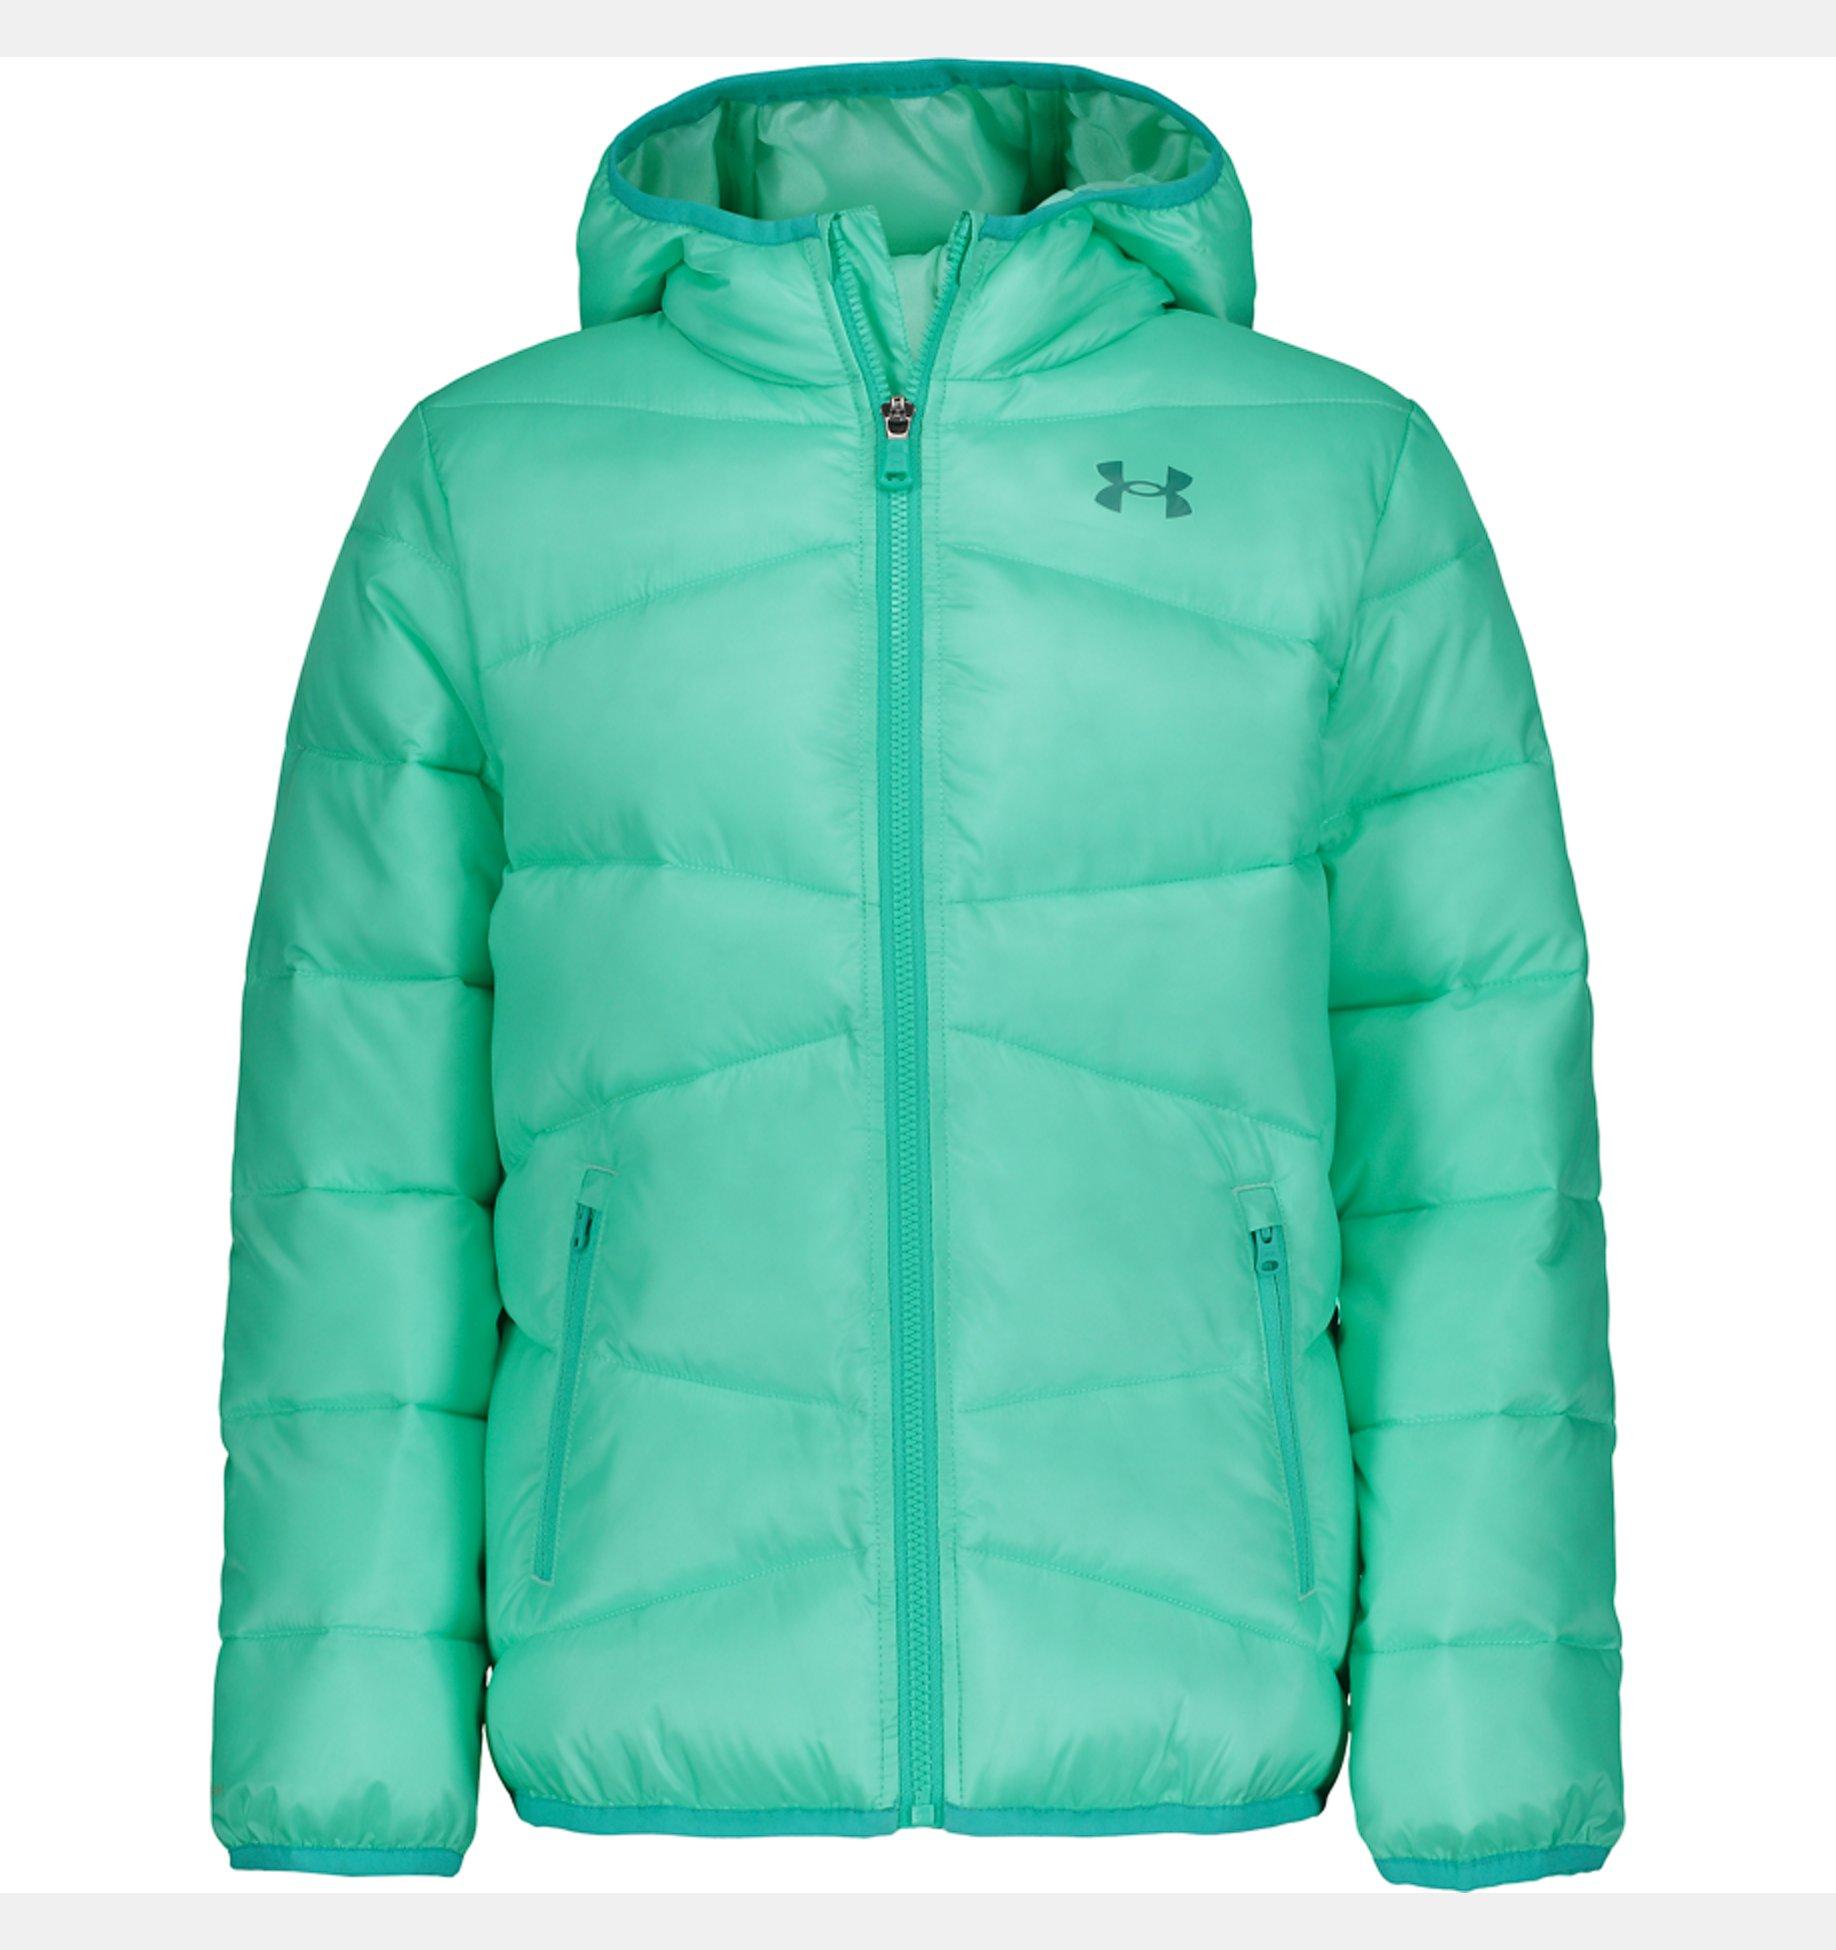 Underarmour Girls UA Prime Puffer Jacket